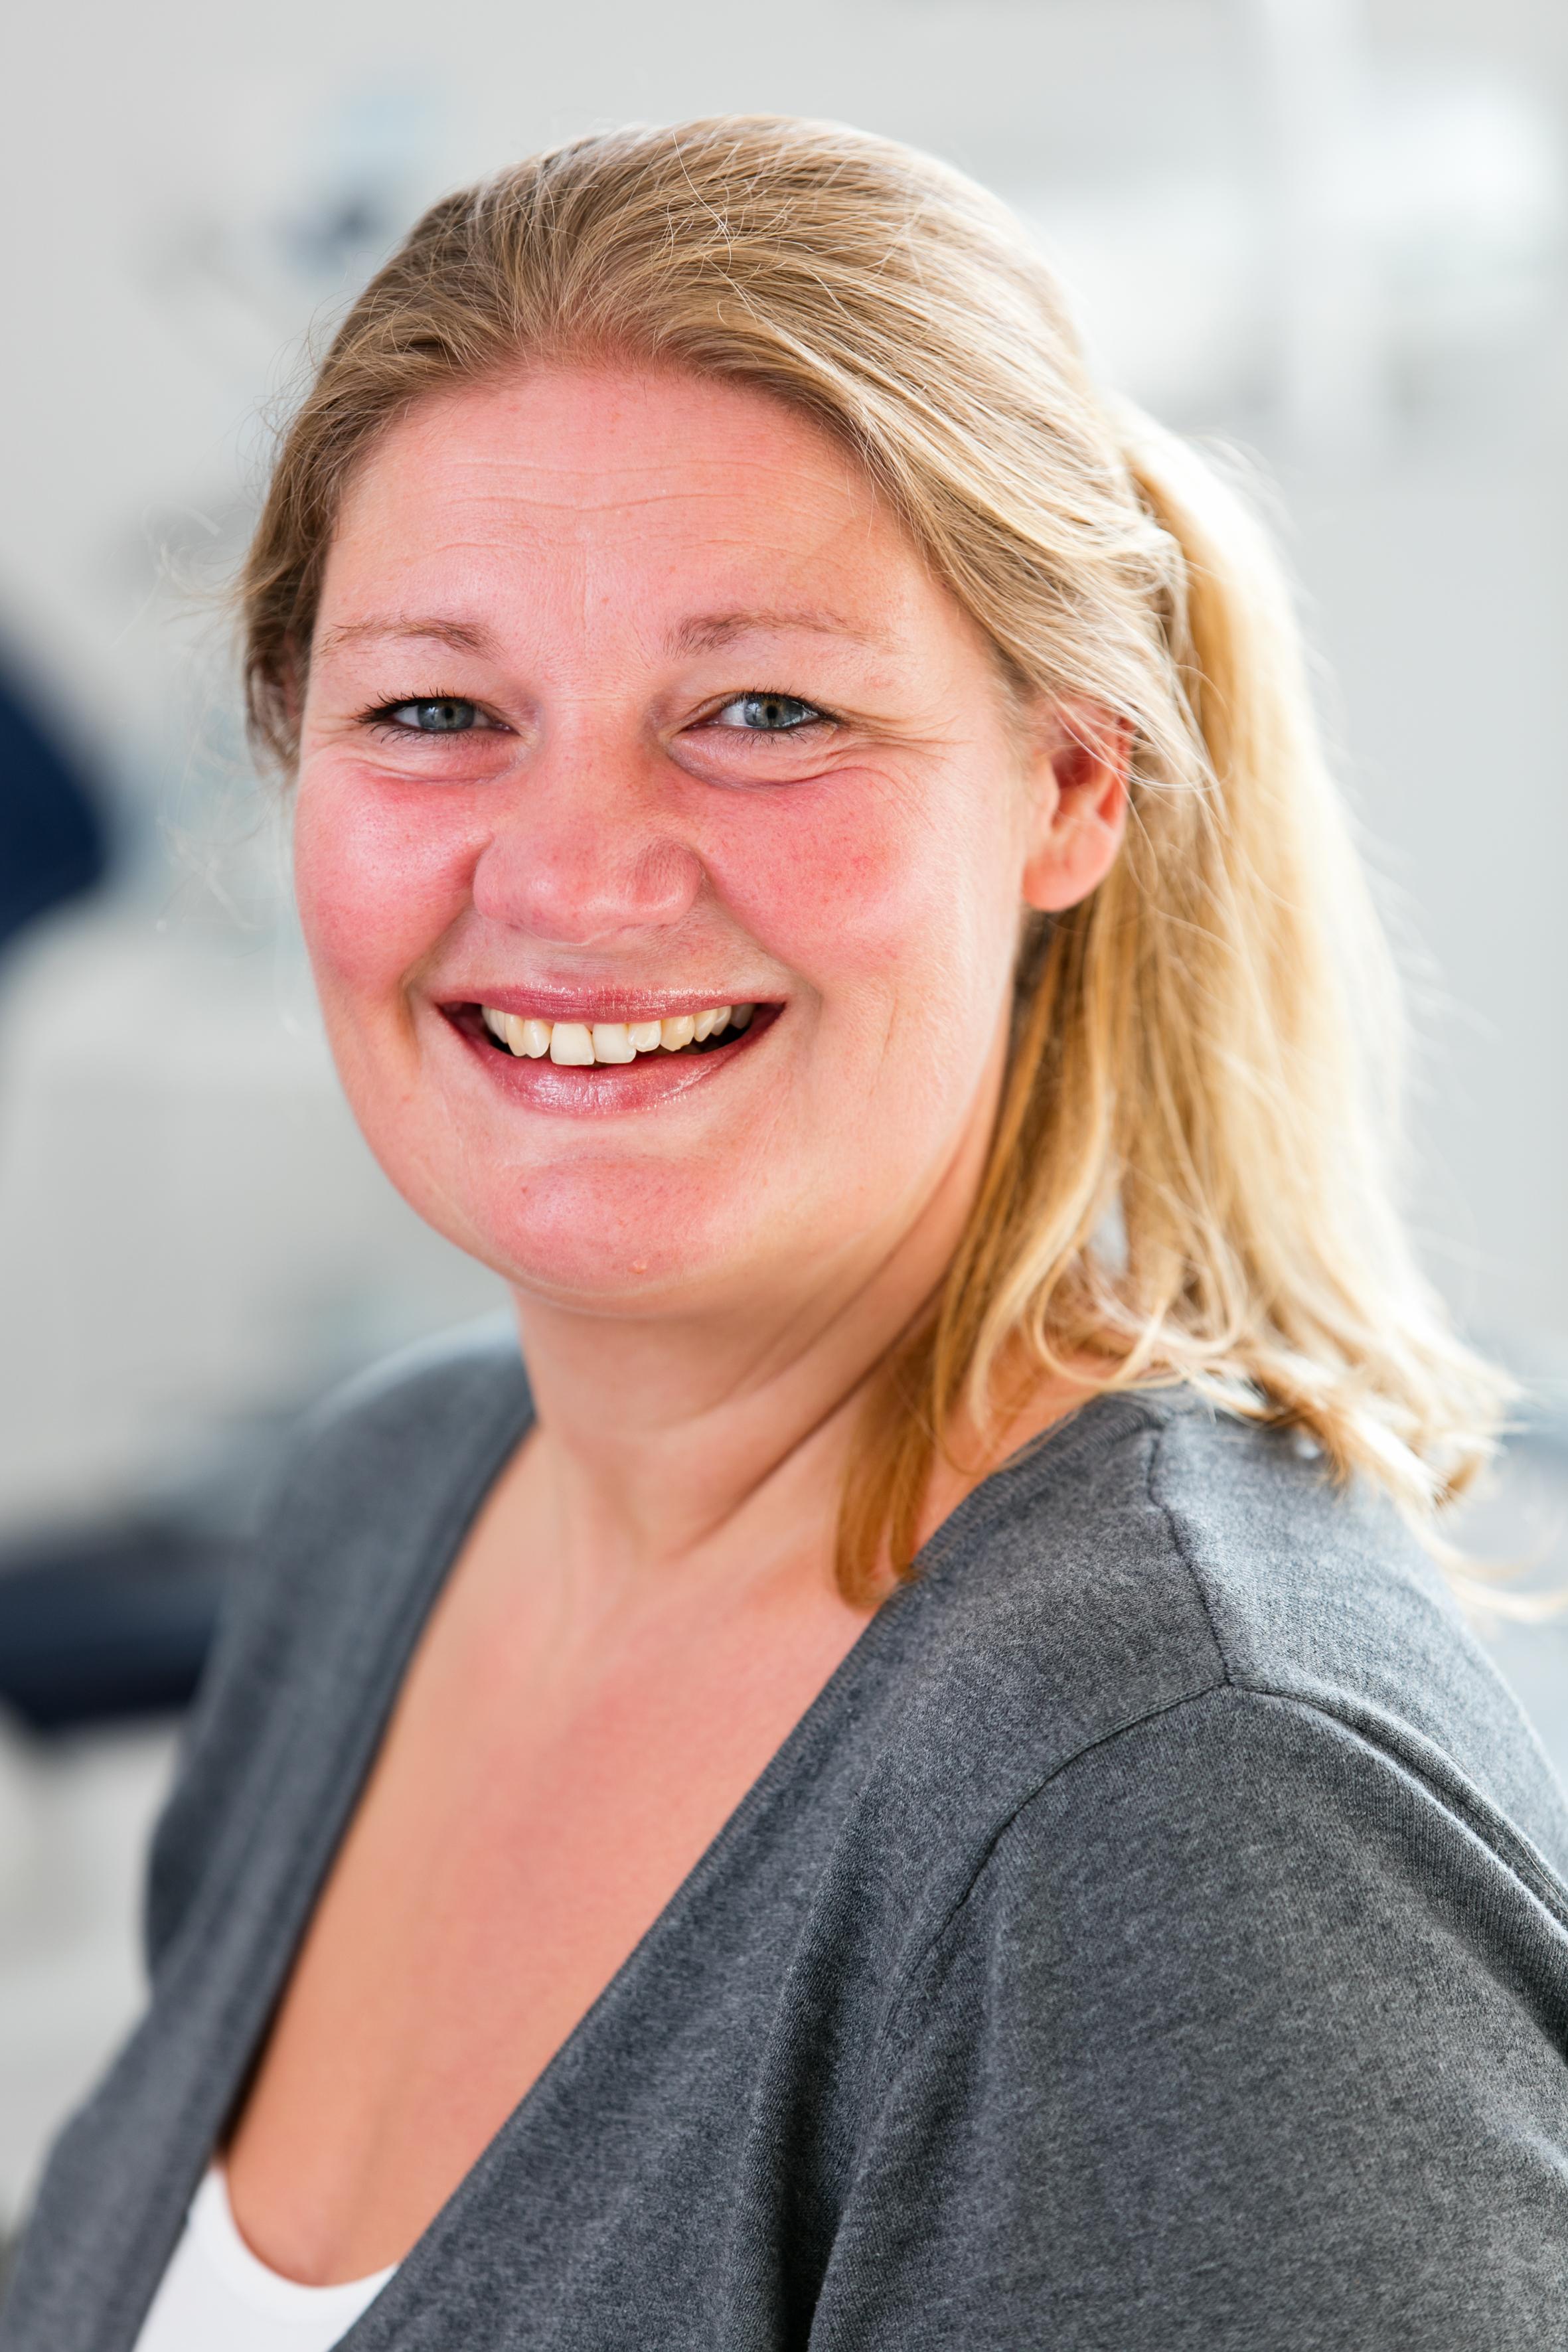 Tandartsenpraktijk Slot - Anita Merks